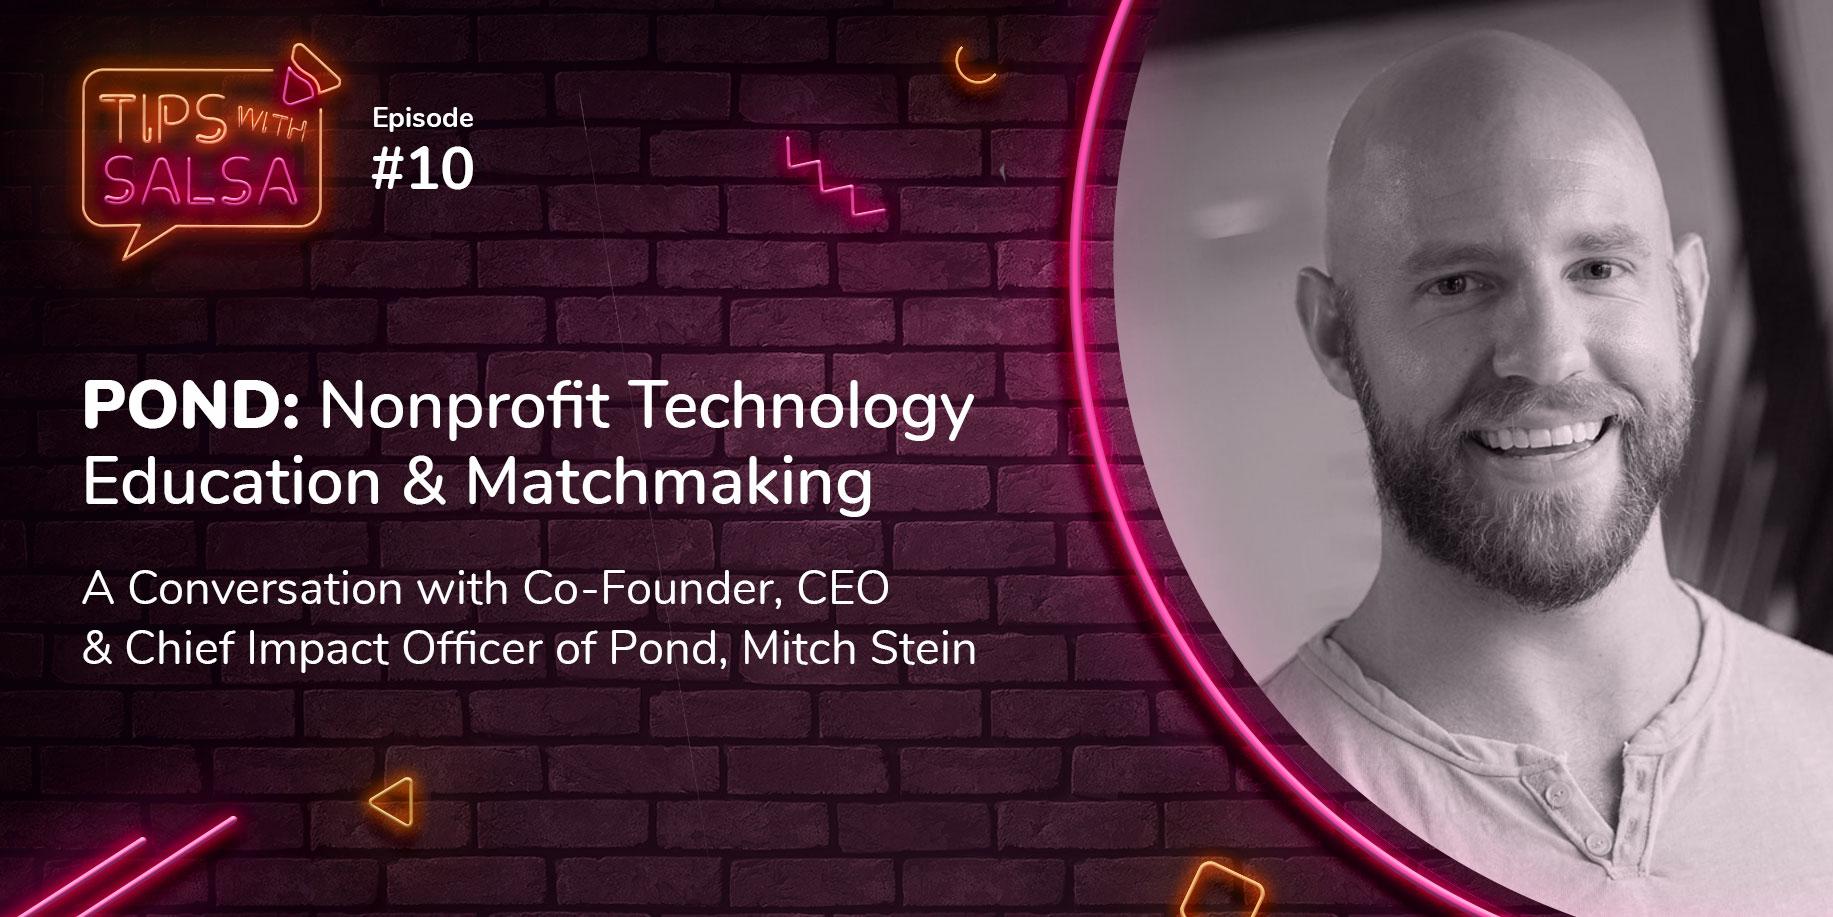 POND: Nonprofit Technology Education & Matchmaking